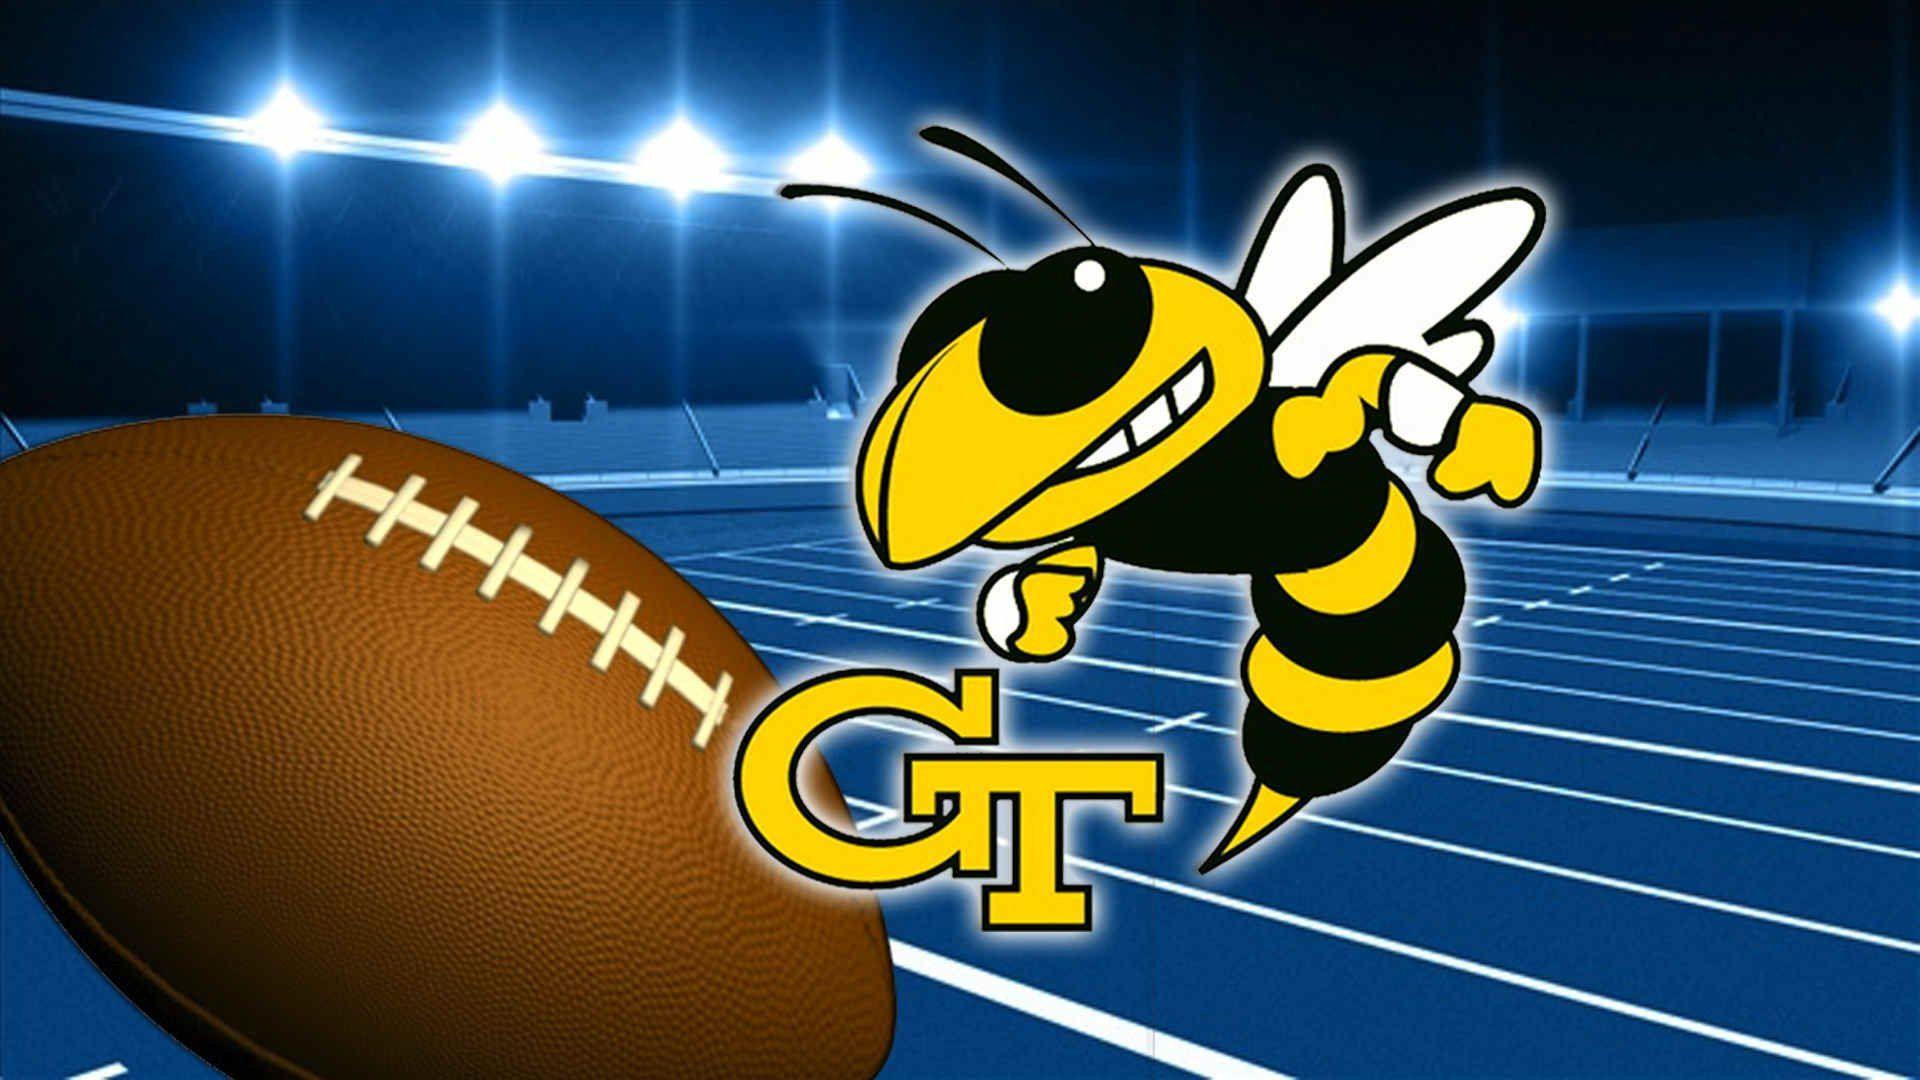 Georgia Tech Yellow Jackets College Football Wallpaper X Georgia Tech Yellow Jackets Football Wallpaper Georgia Tech